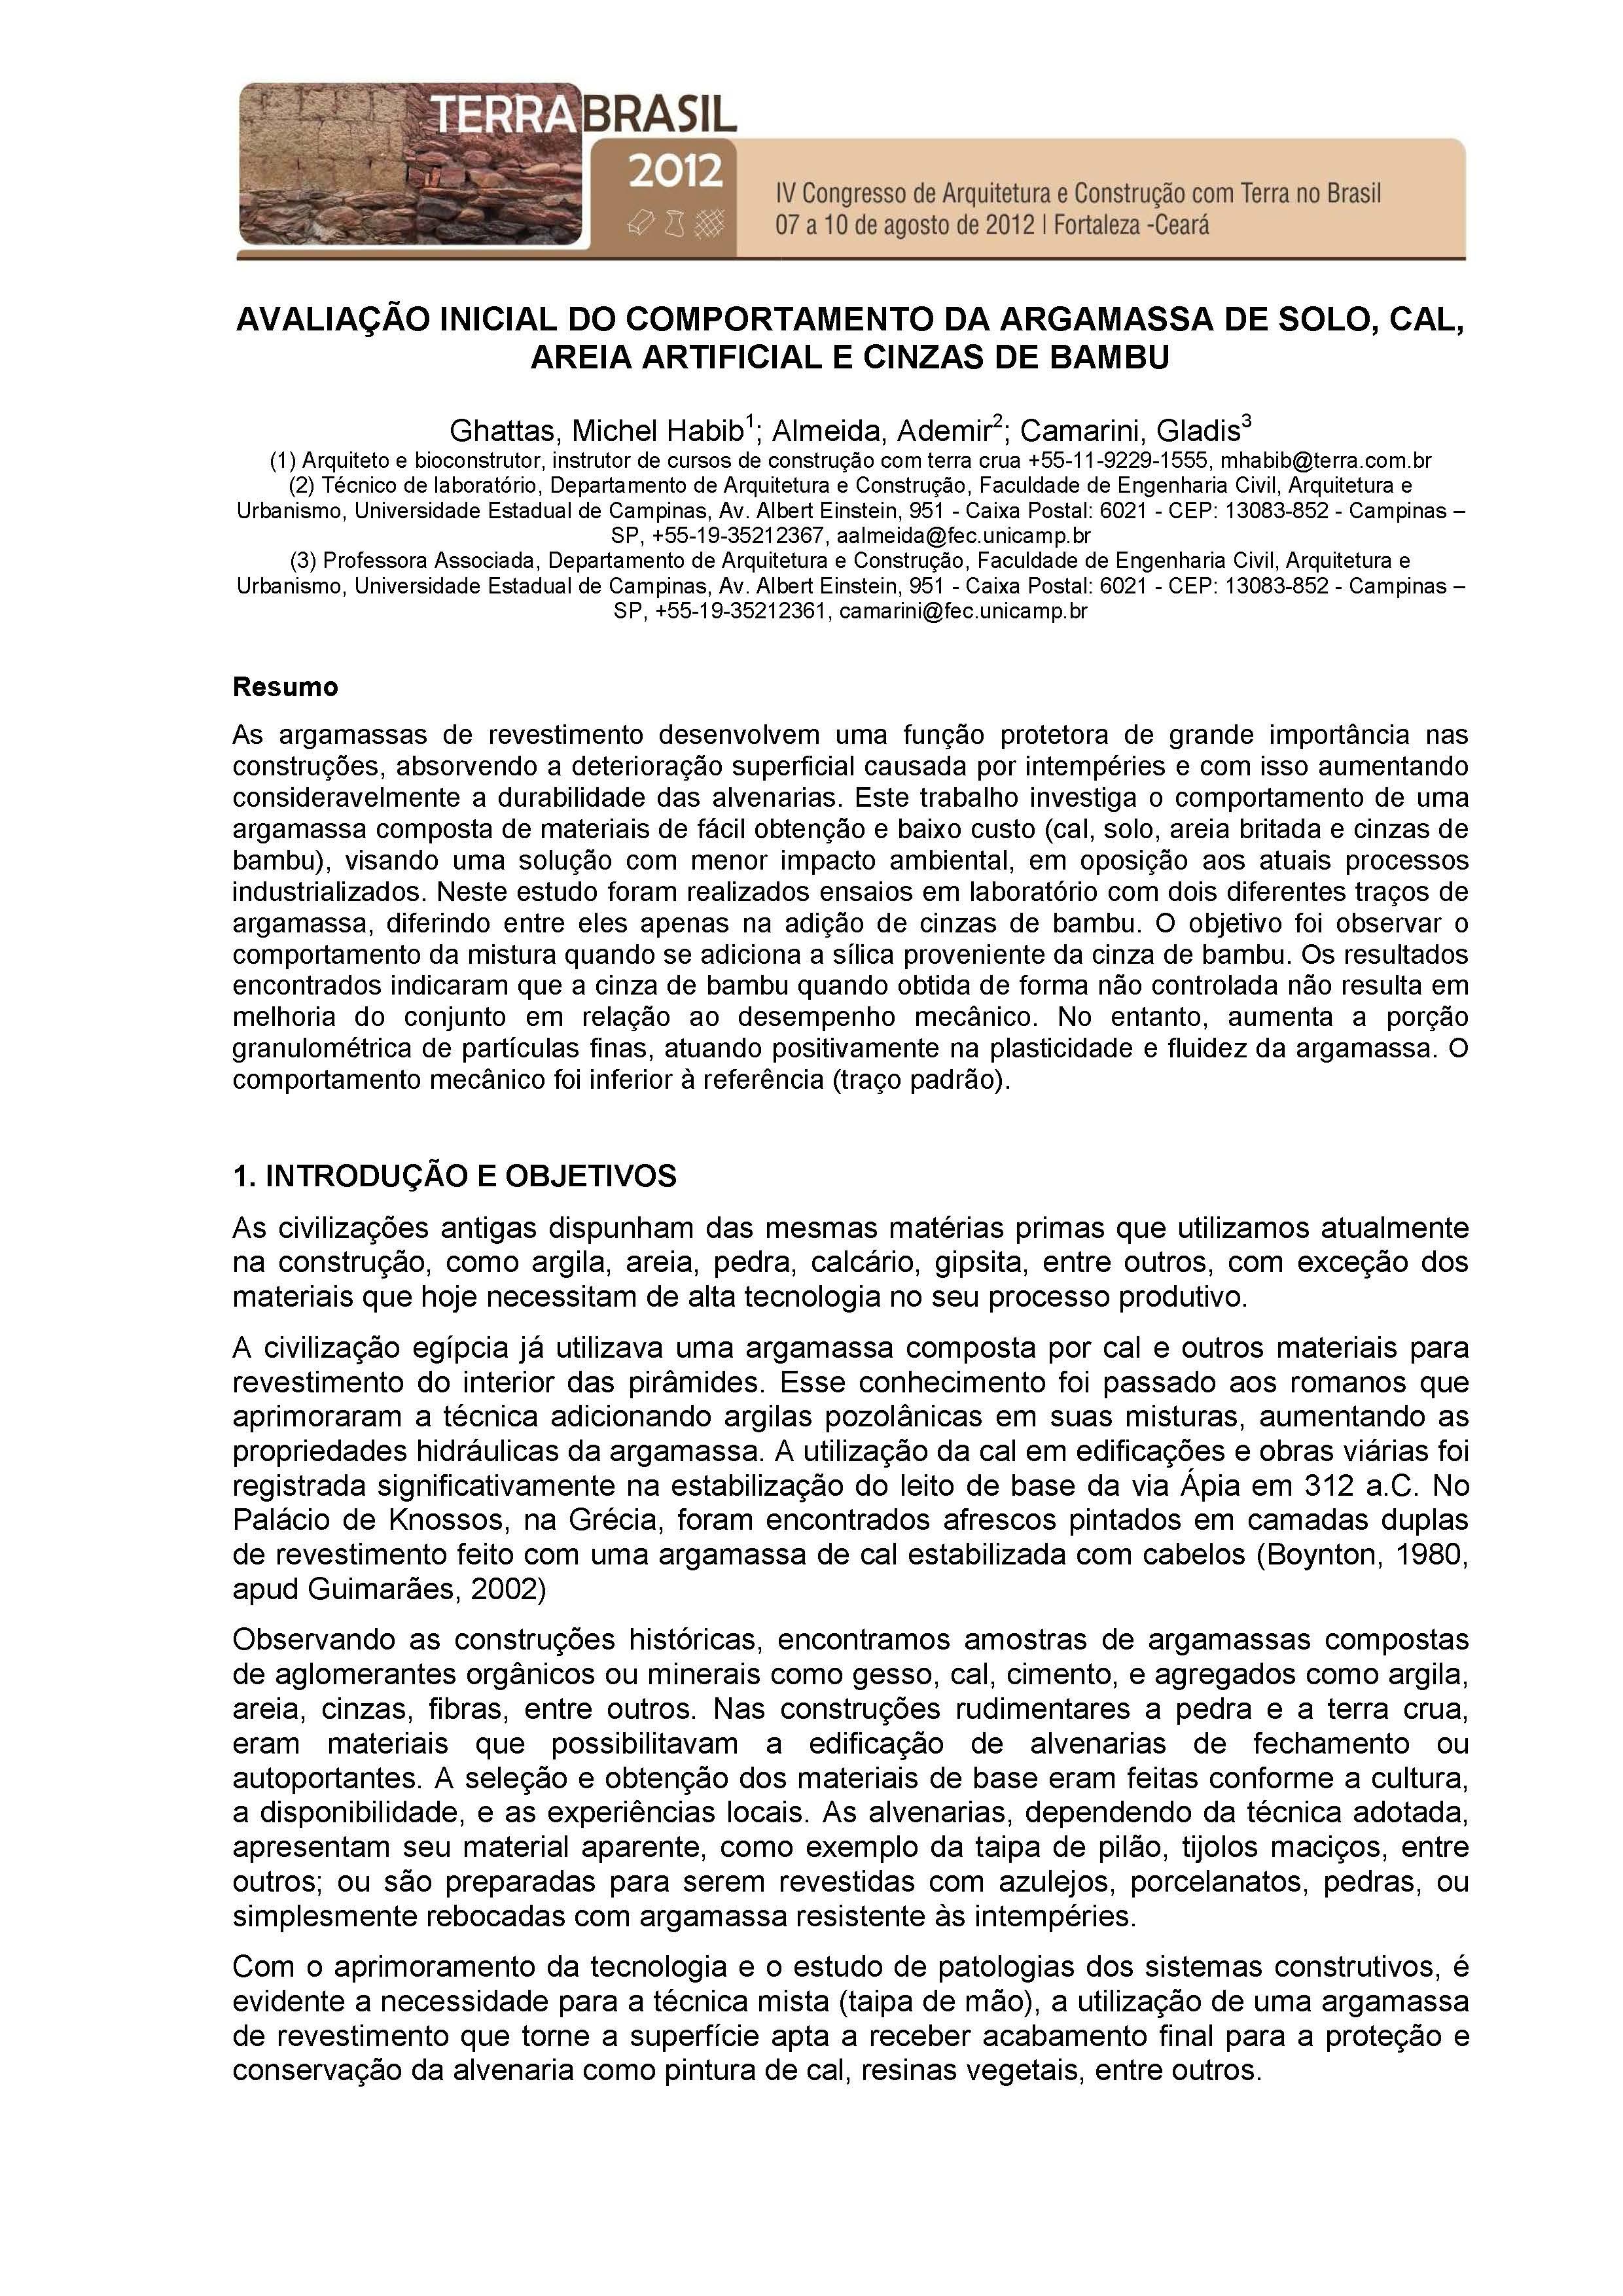 T1_-_Ghattas,_Almeida,_Camarini_R5_-_FINAL_Página_01.jpg